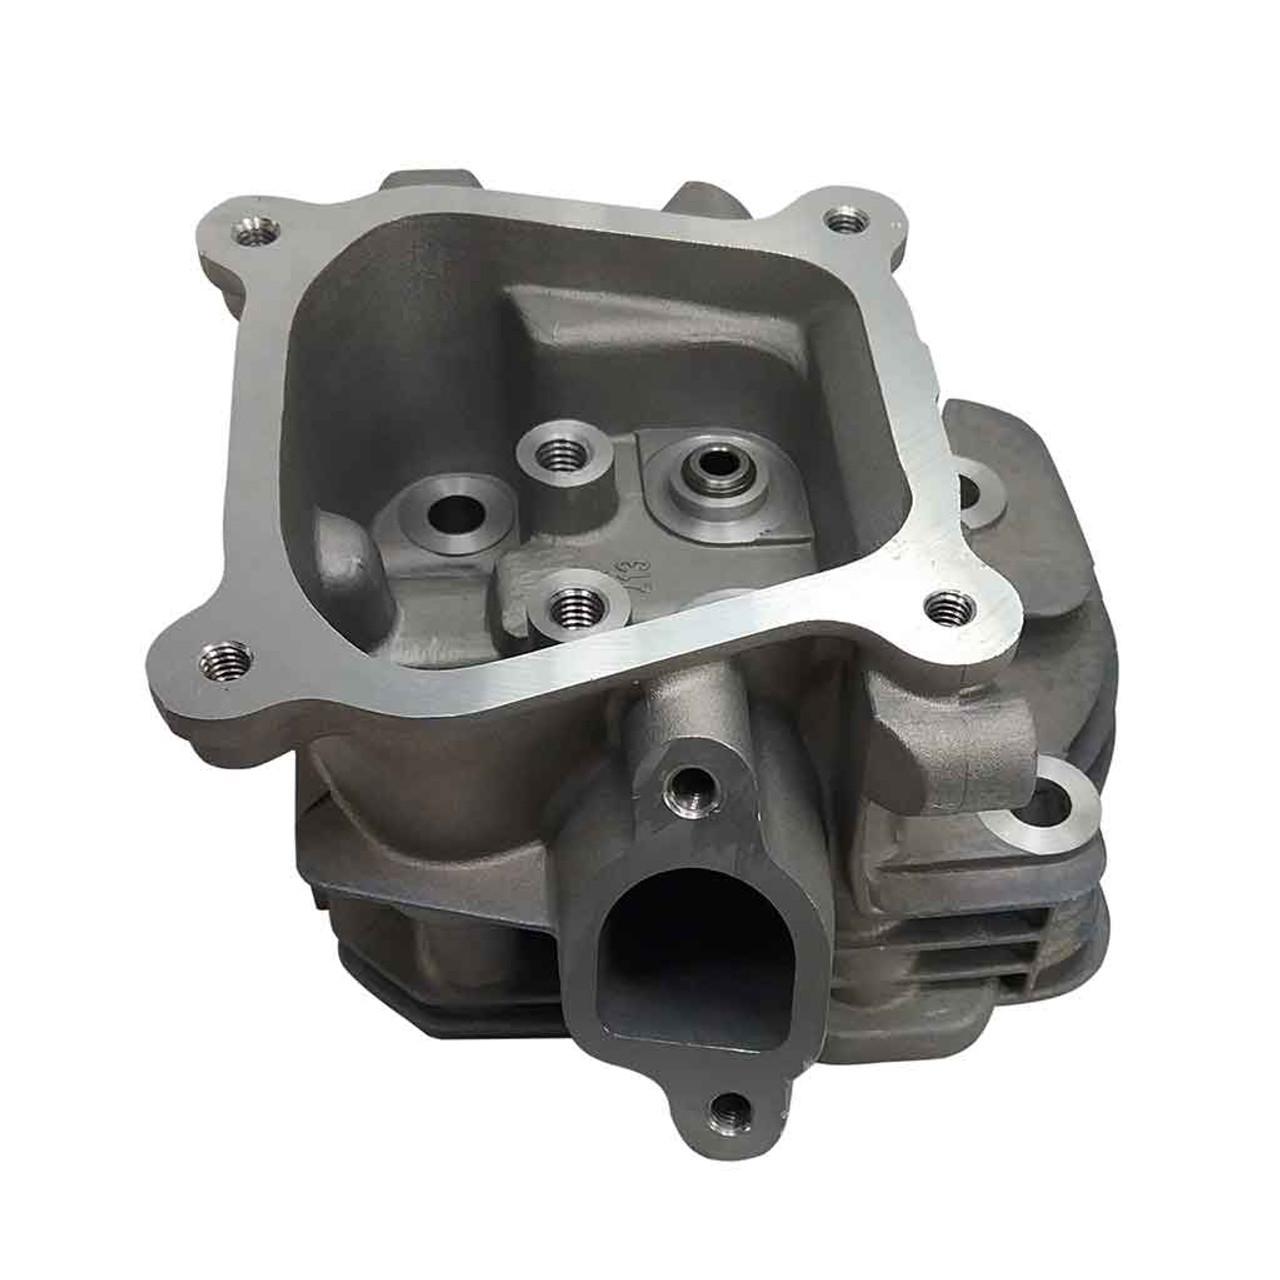 Cylinder Head for Predator - HI COMP 14cc